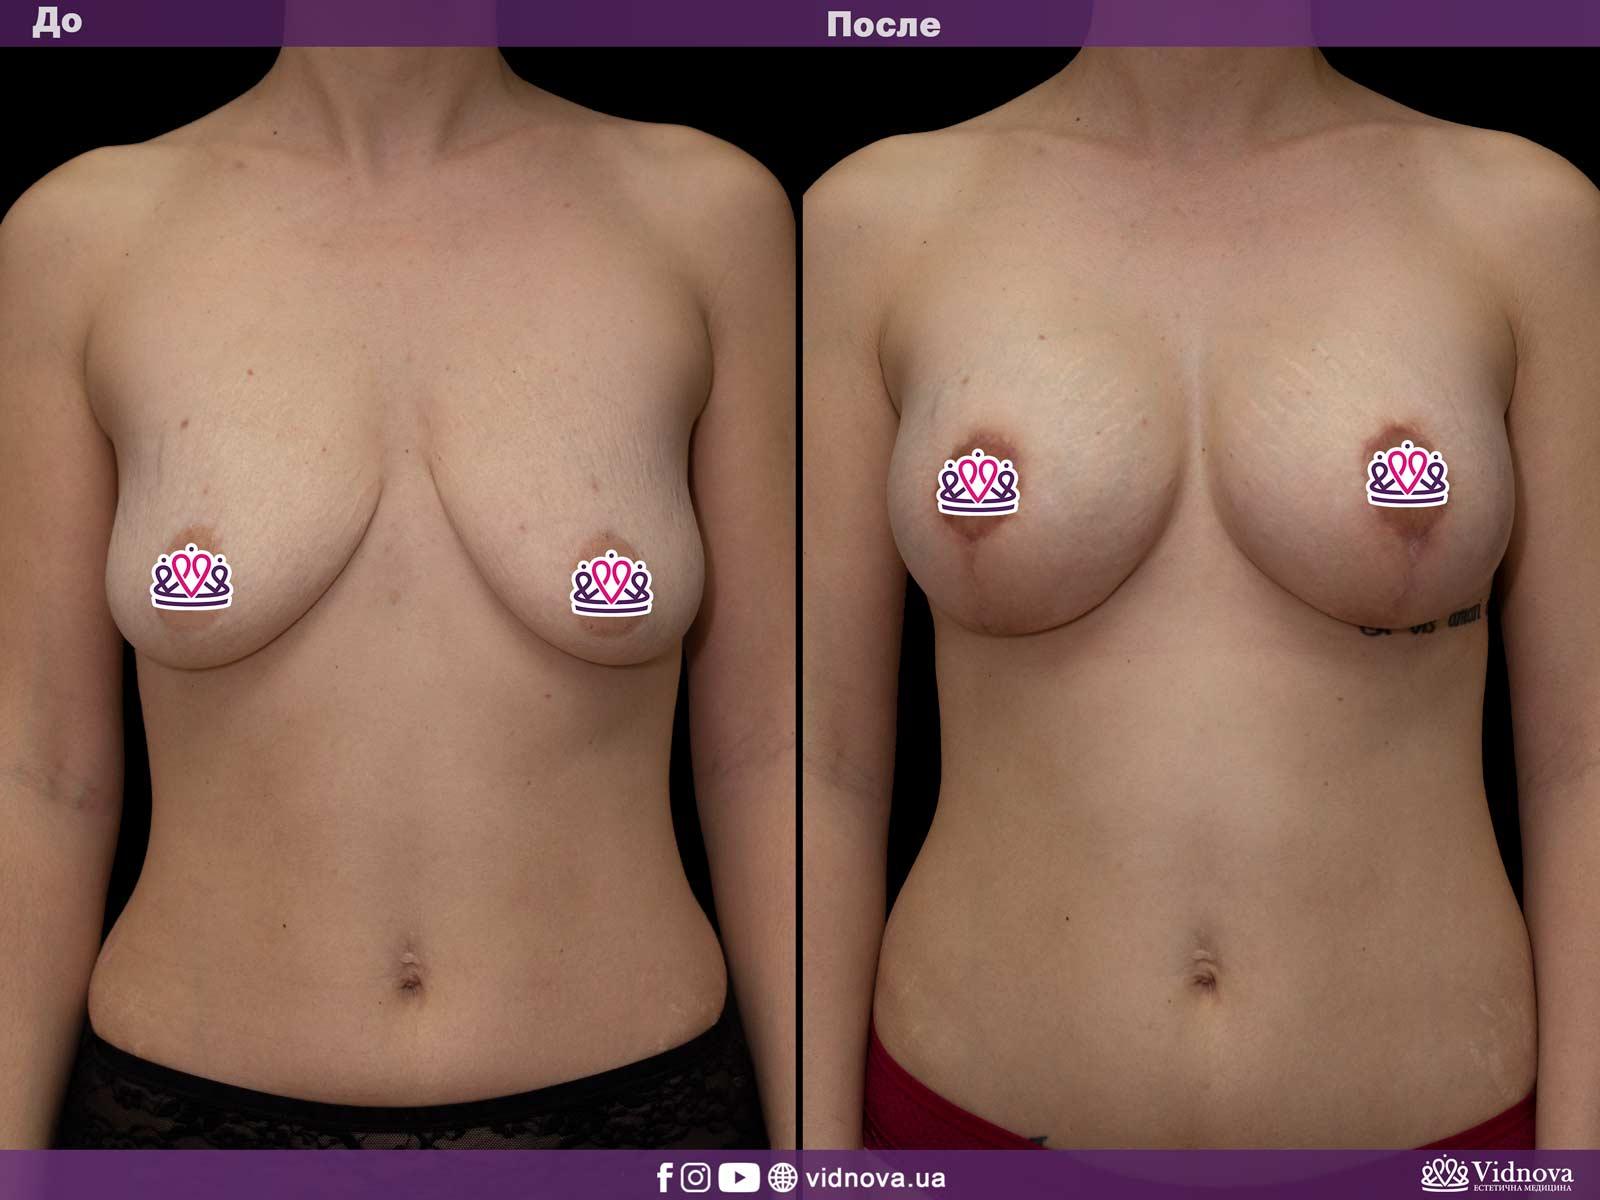 Подтяжка груди: Фото ДО и ПОСЛЕ - Пример №14-1 - Клиника Vidnova